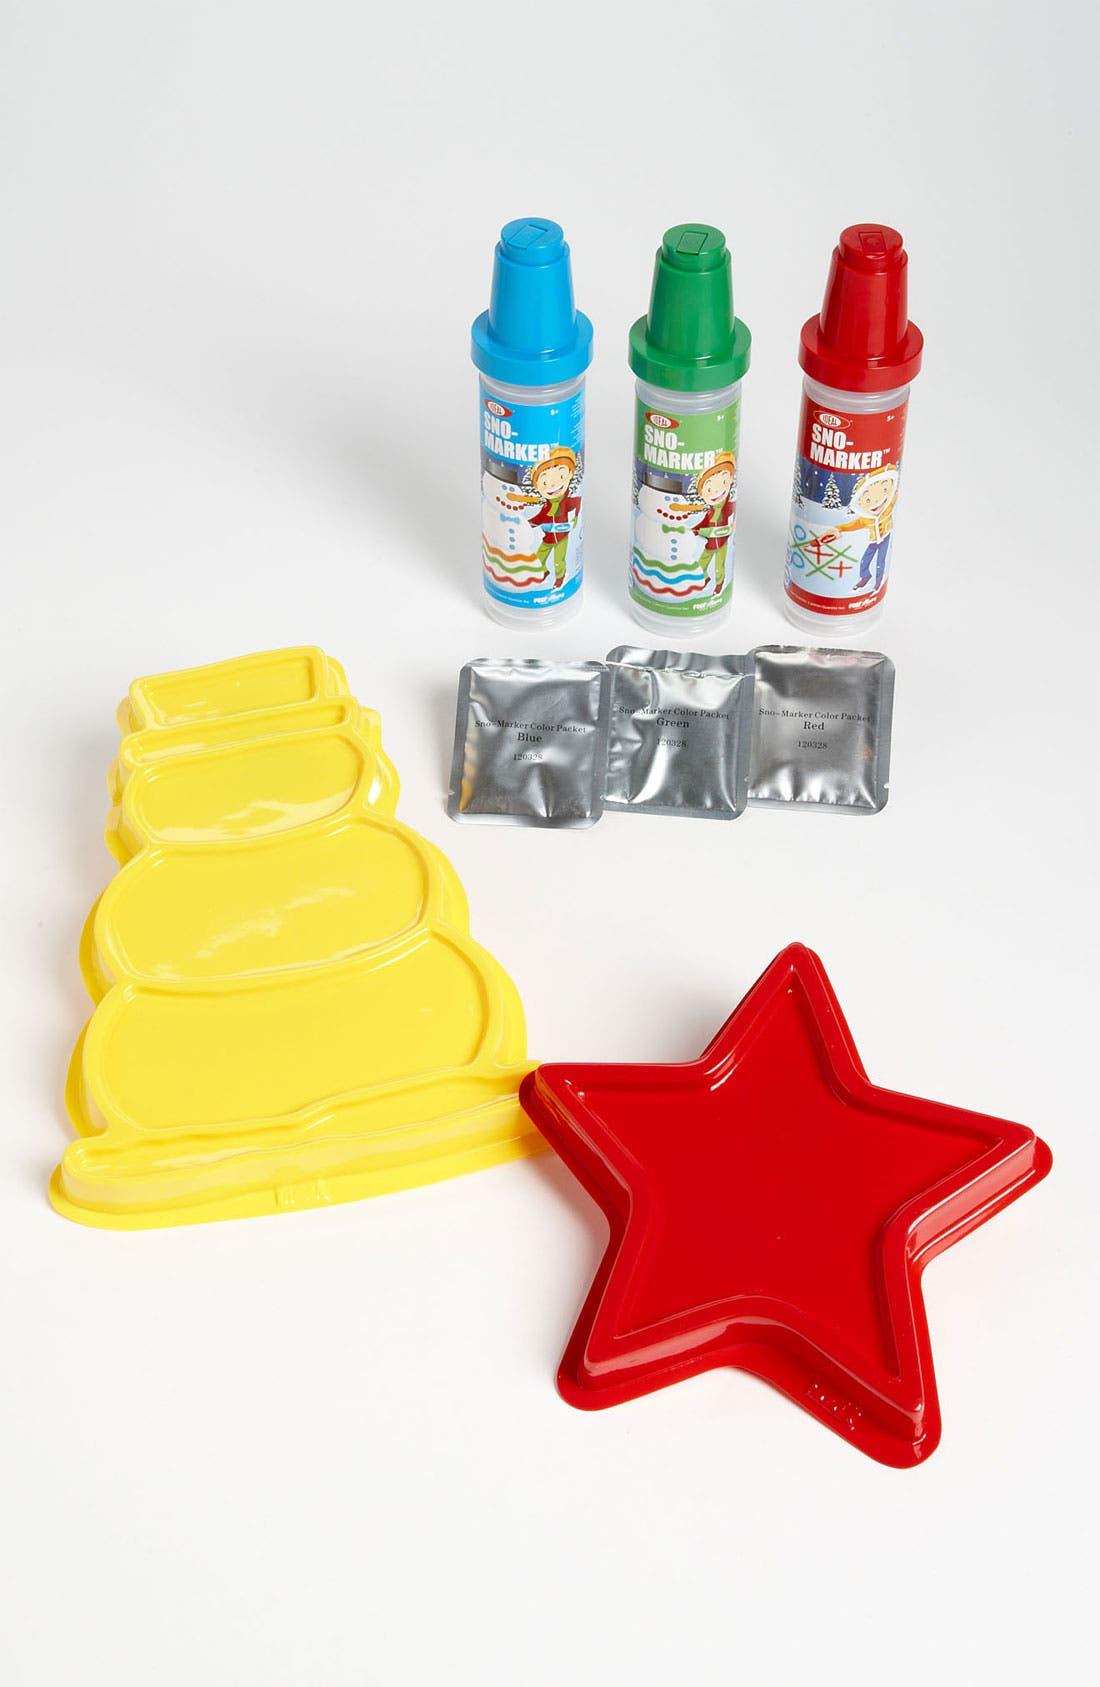 Main Image - Poof-Slinky Snow Art Kit